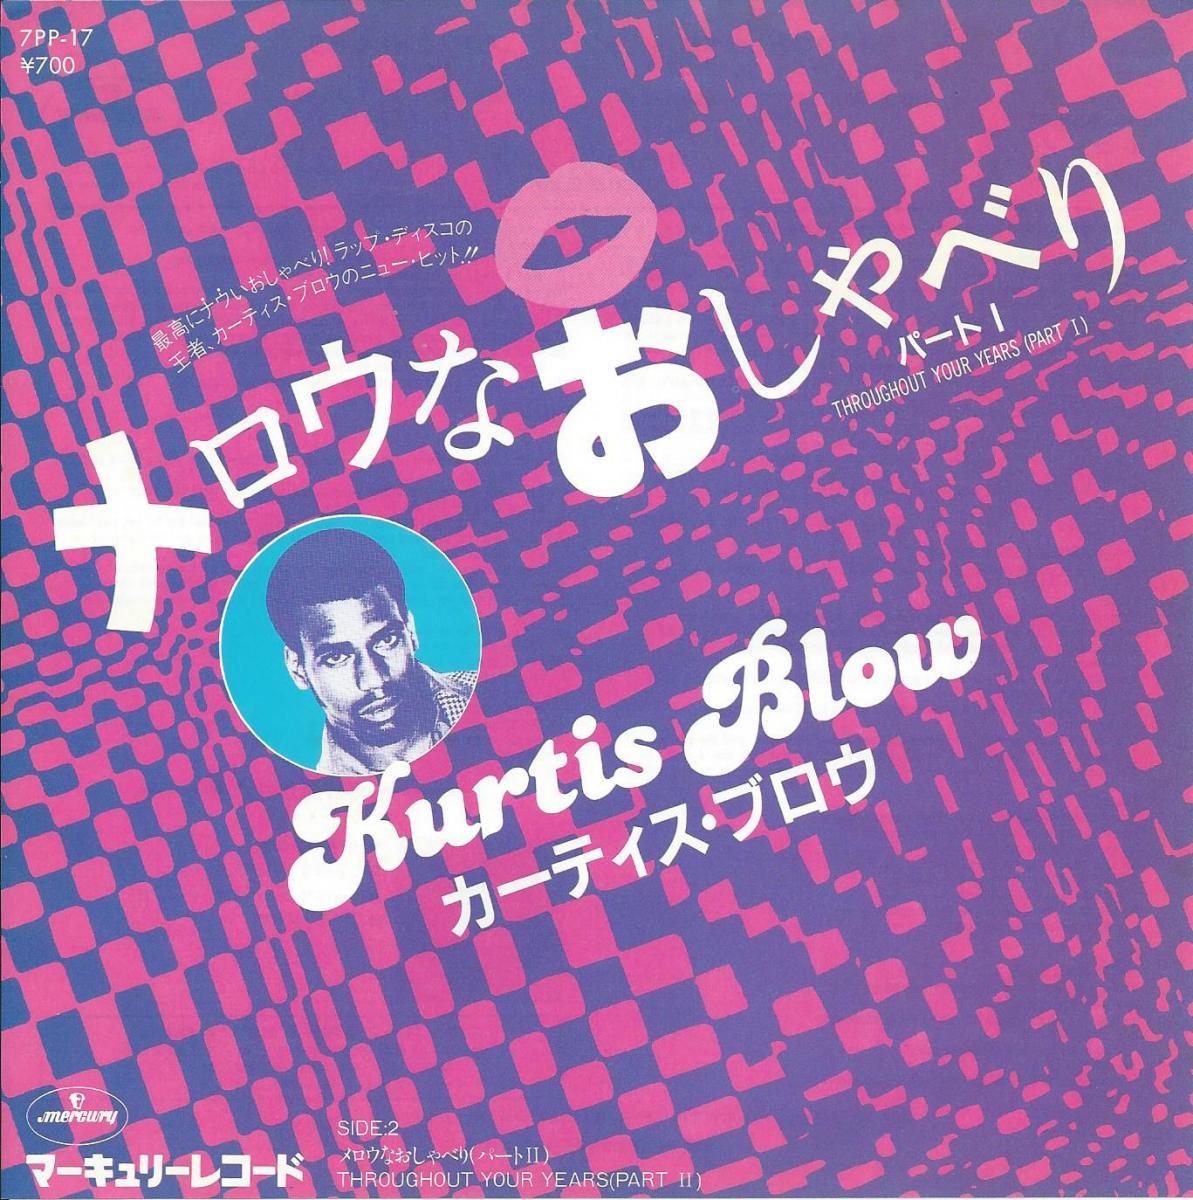 KURTIS BLOW カーティス・ブロウ / THROUGHOUT YOUR YEARS メロウなおしゃべり (7